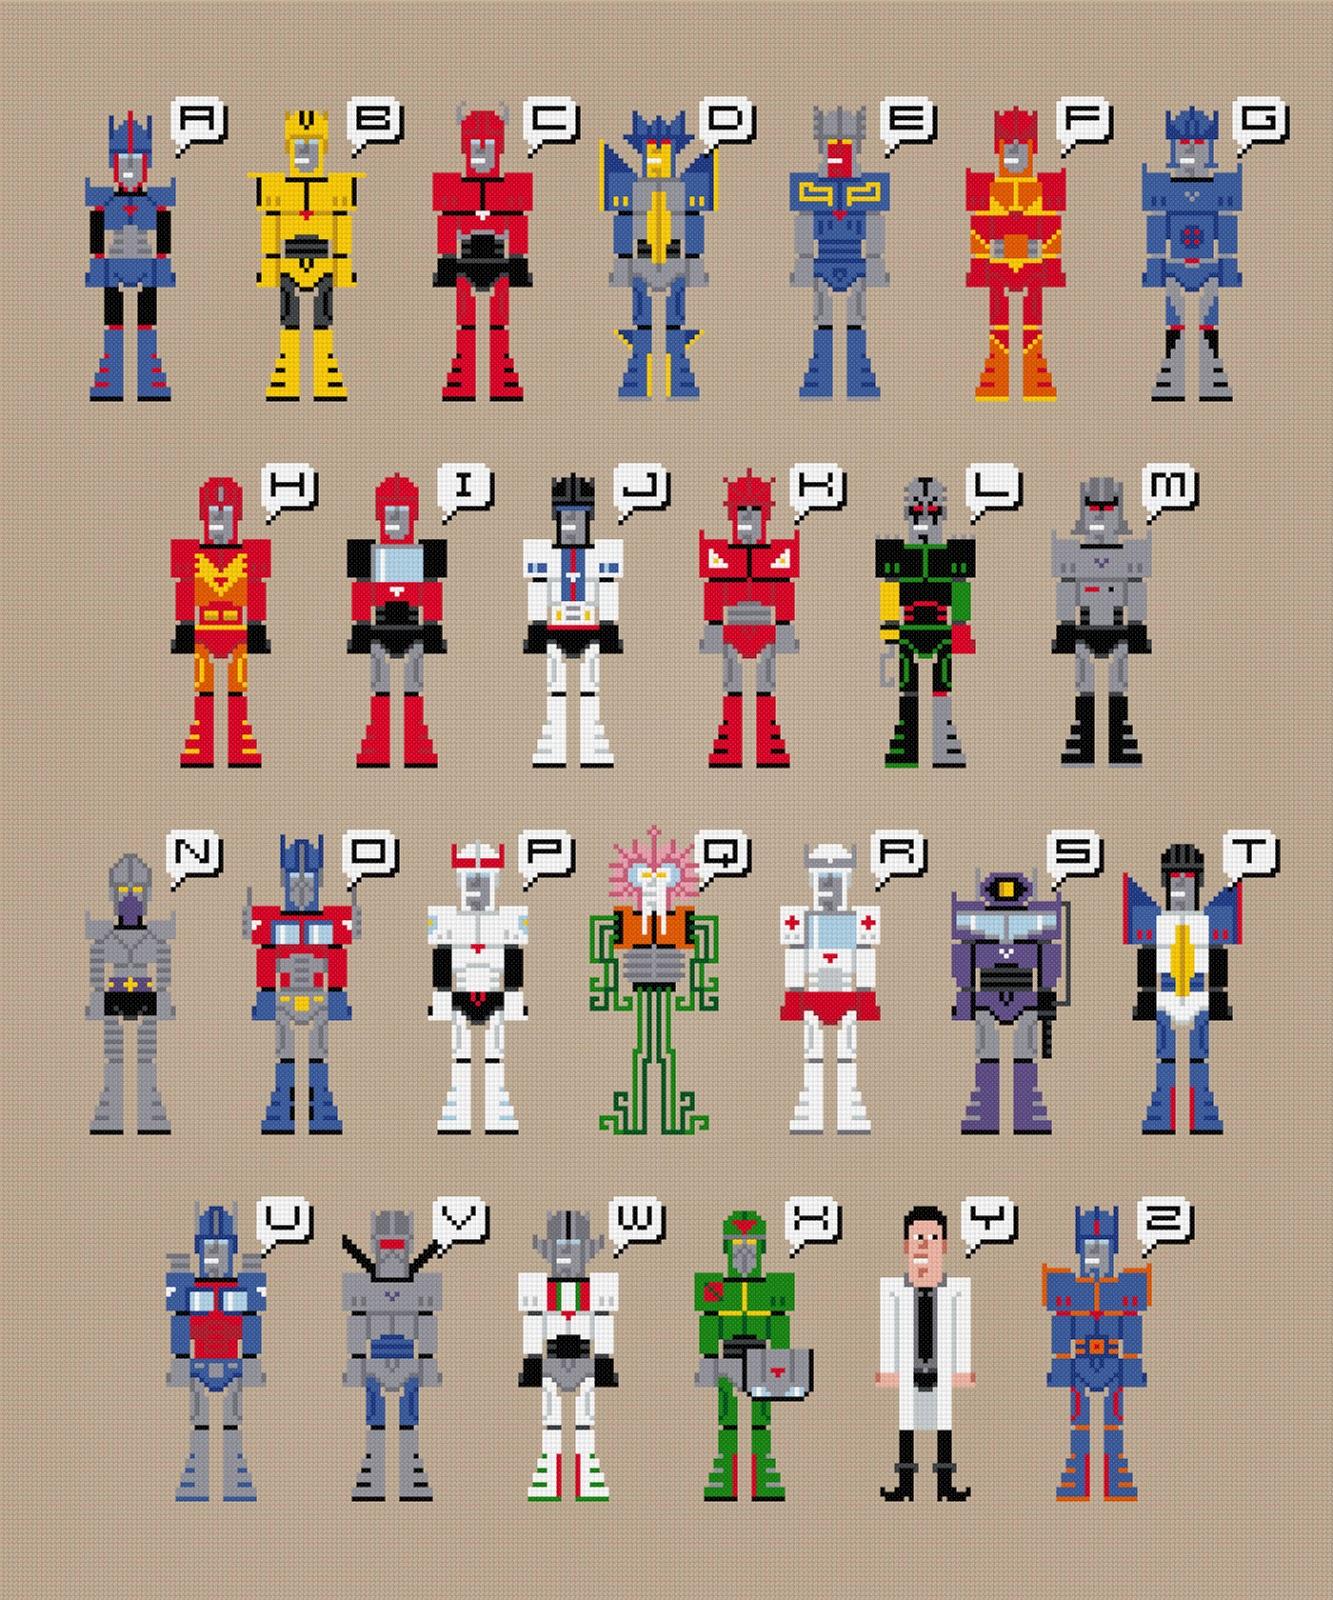 Transformers Alphabet - Cross Stitch PDF Pattern Download